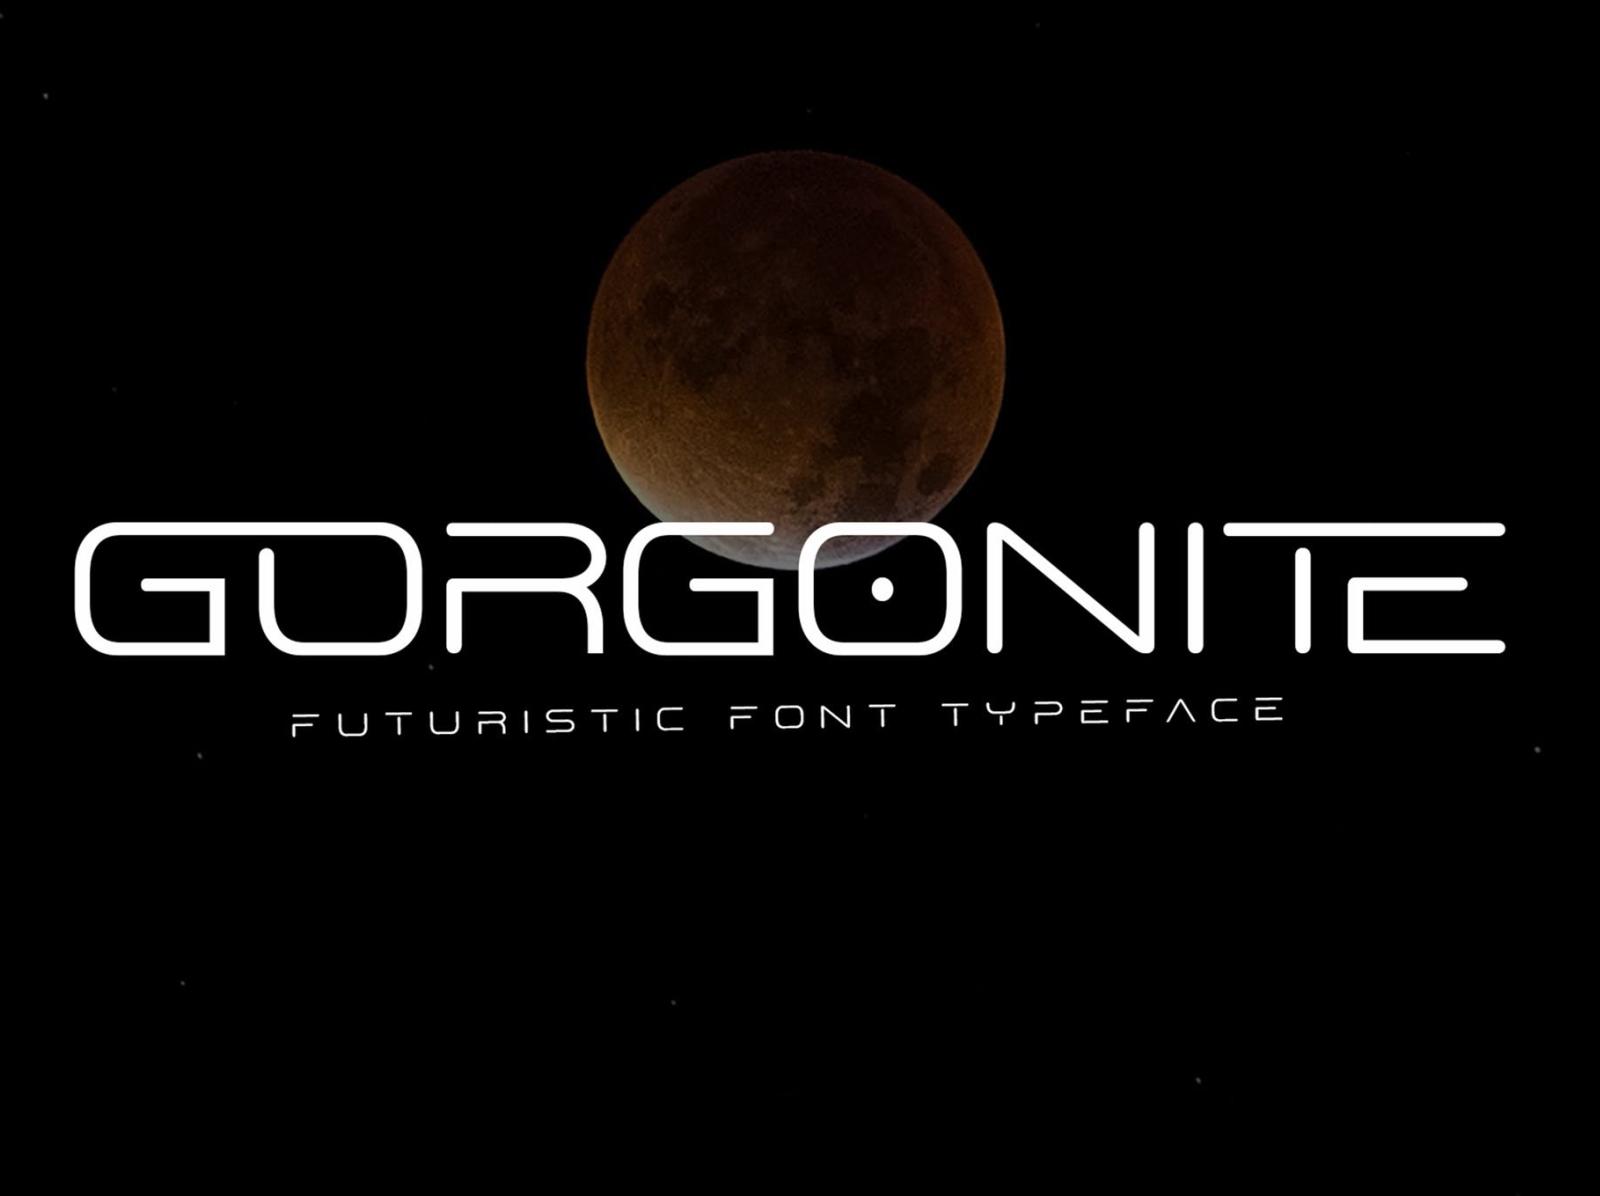 Gorgonite Futuristic Display Font display font font display futuristic gorgonite ux vector ui app logo typography illustration graphic design design branding